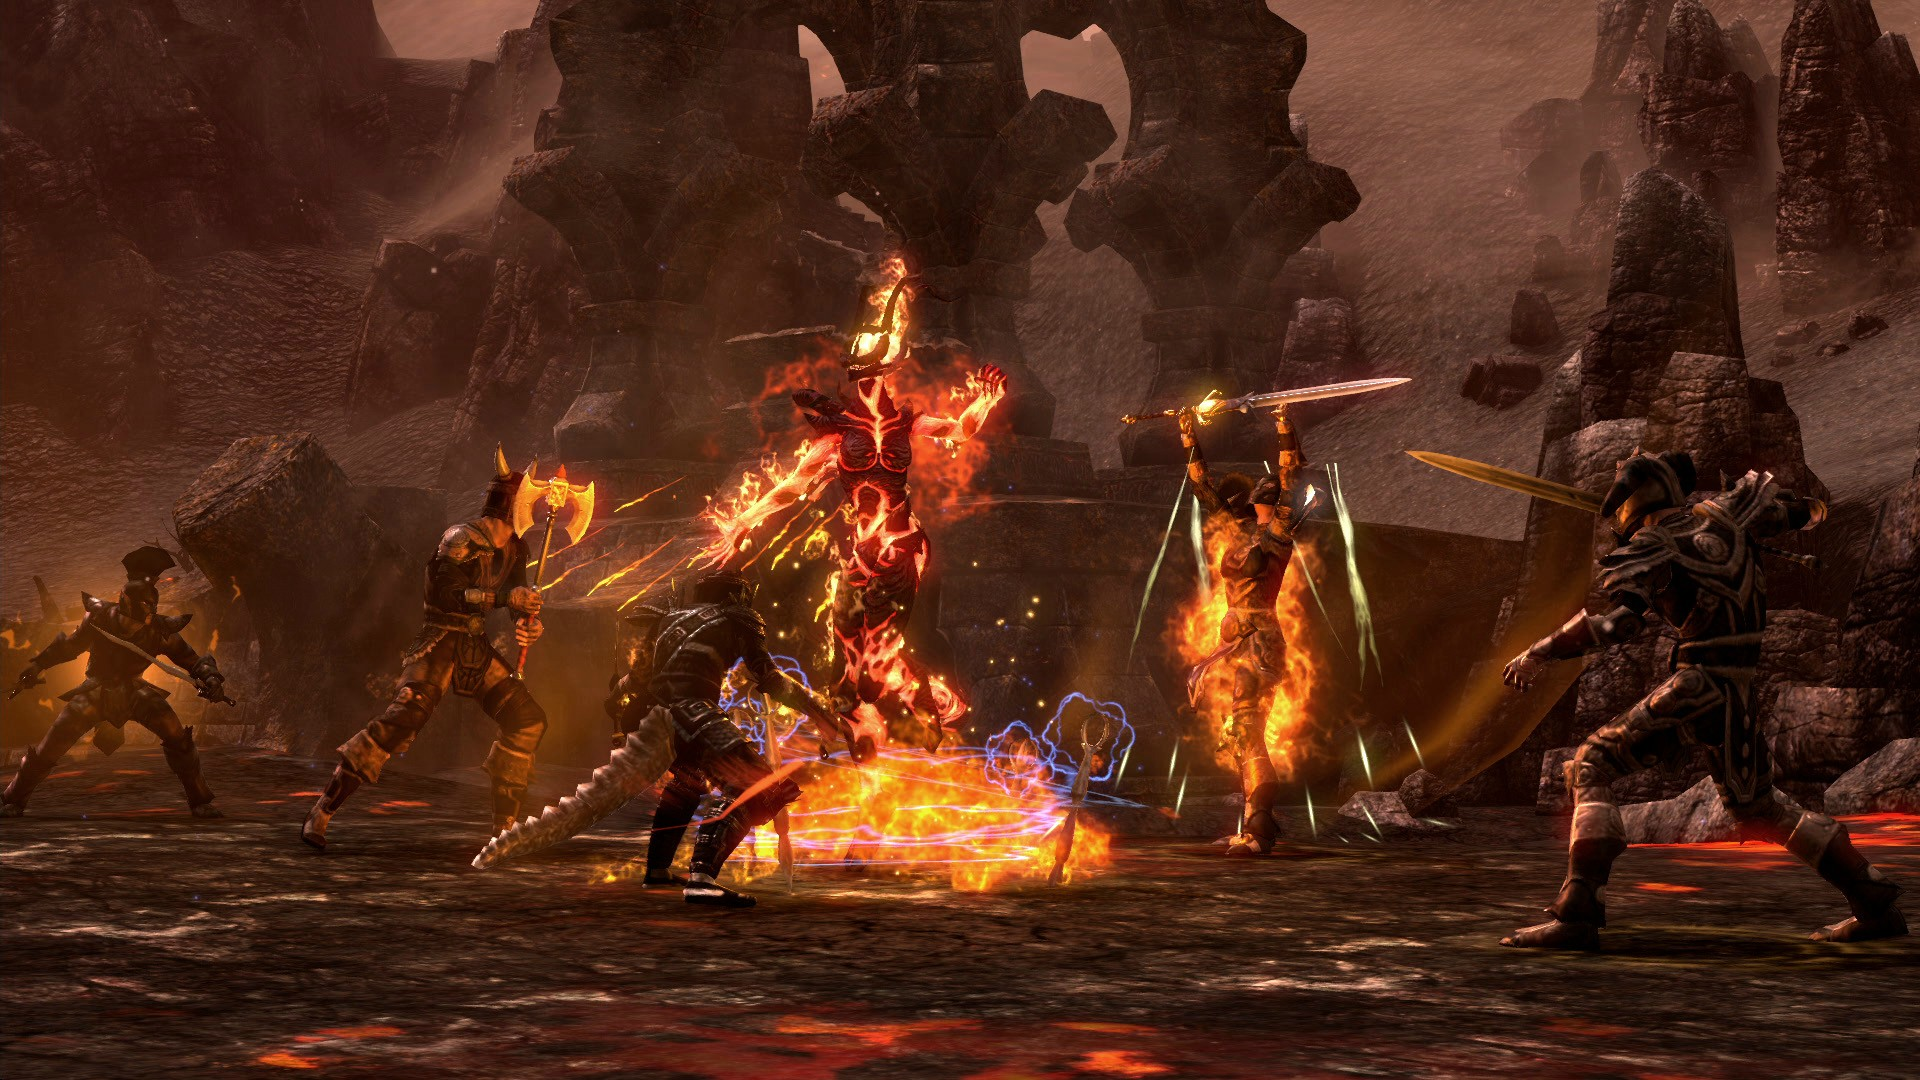 Elder Scrolls Online Screenshots Travel Across Tamriel #24407